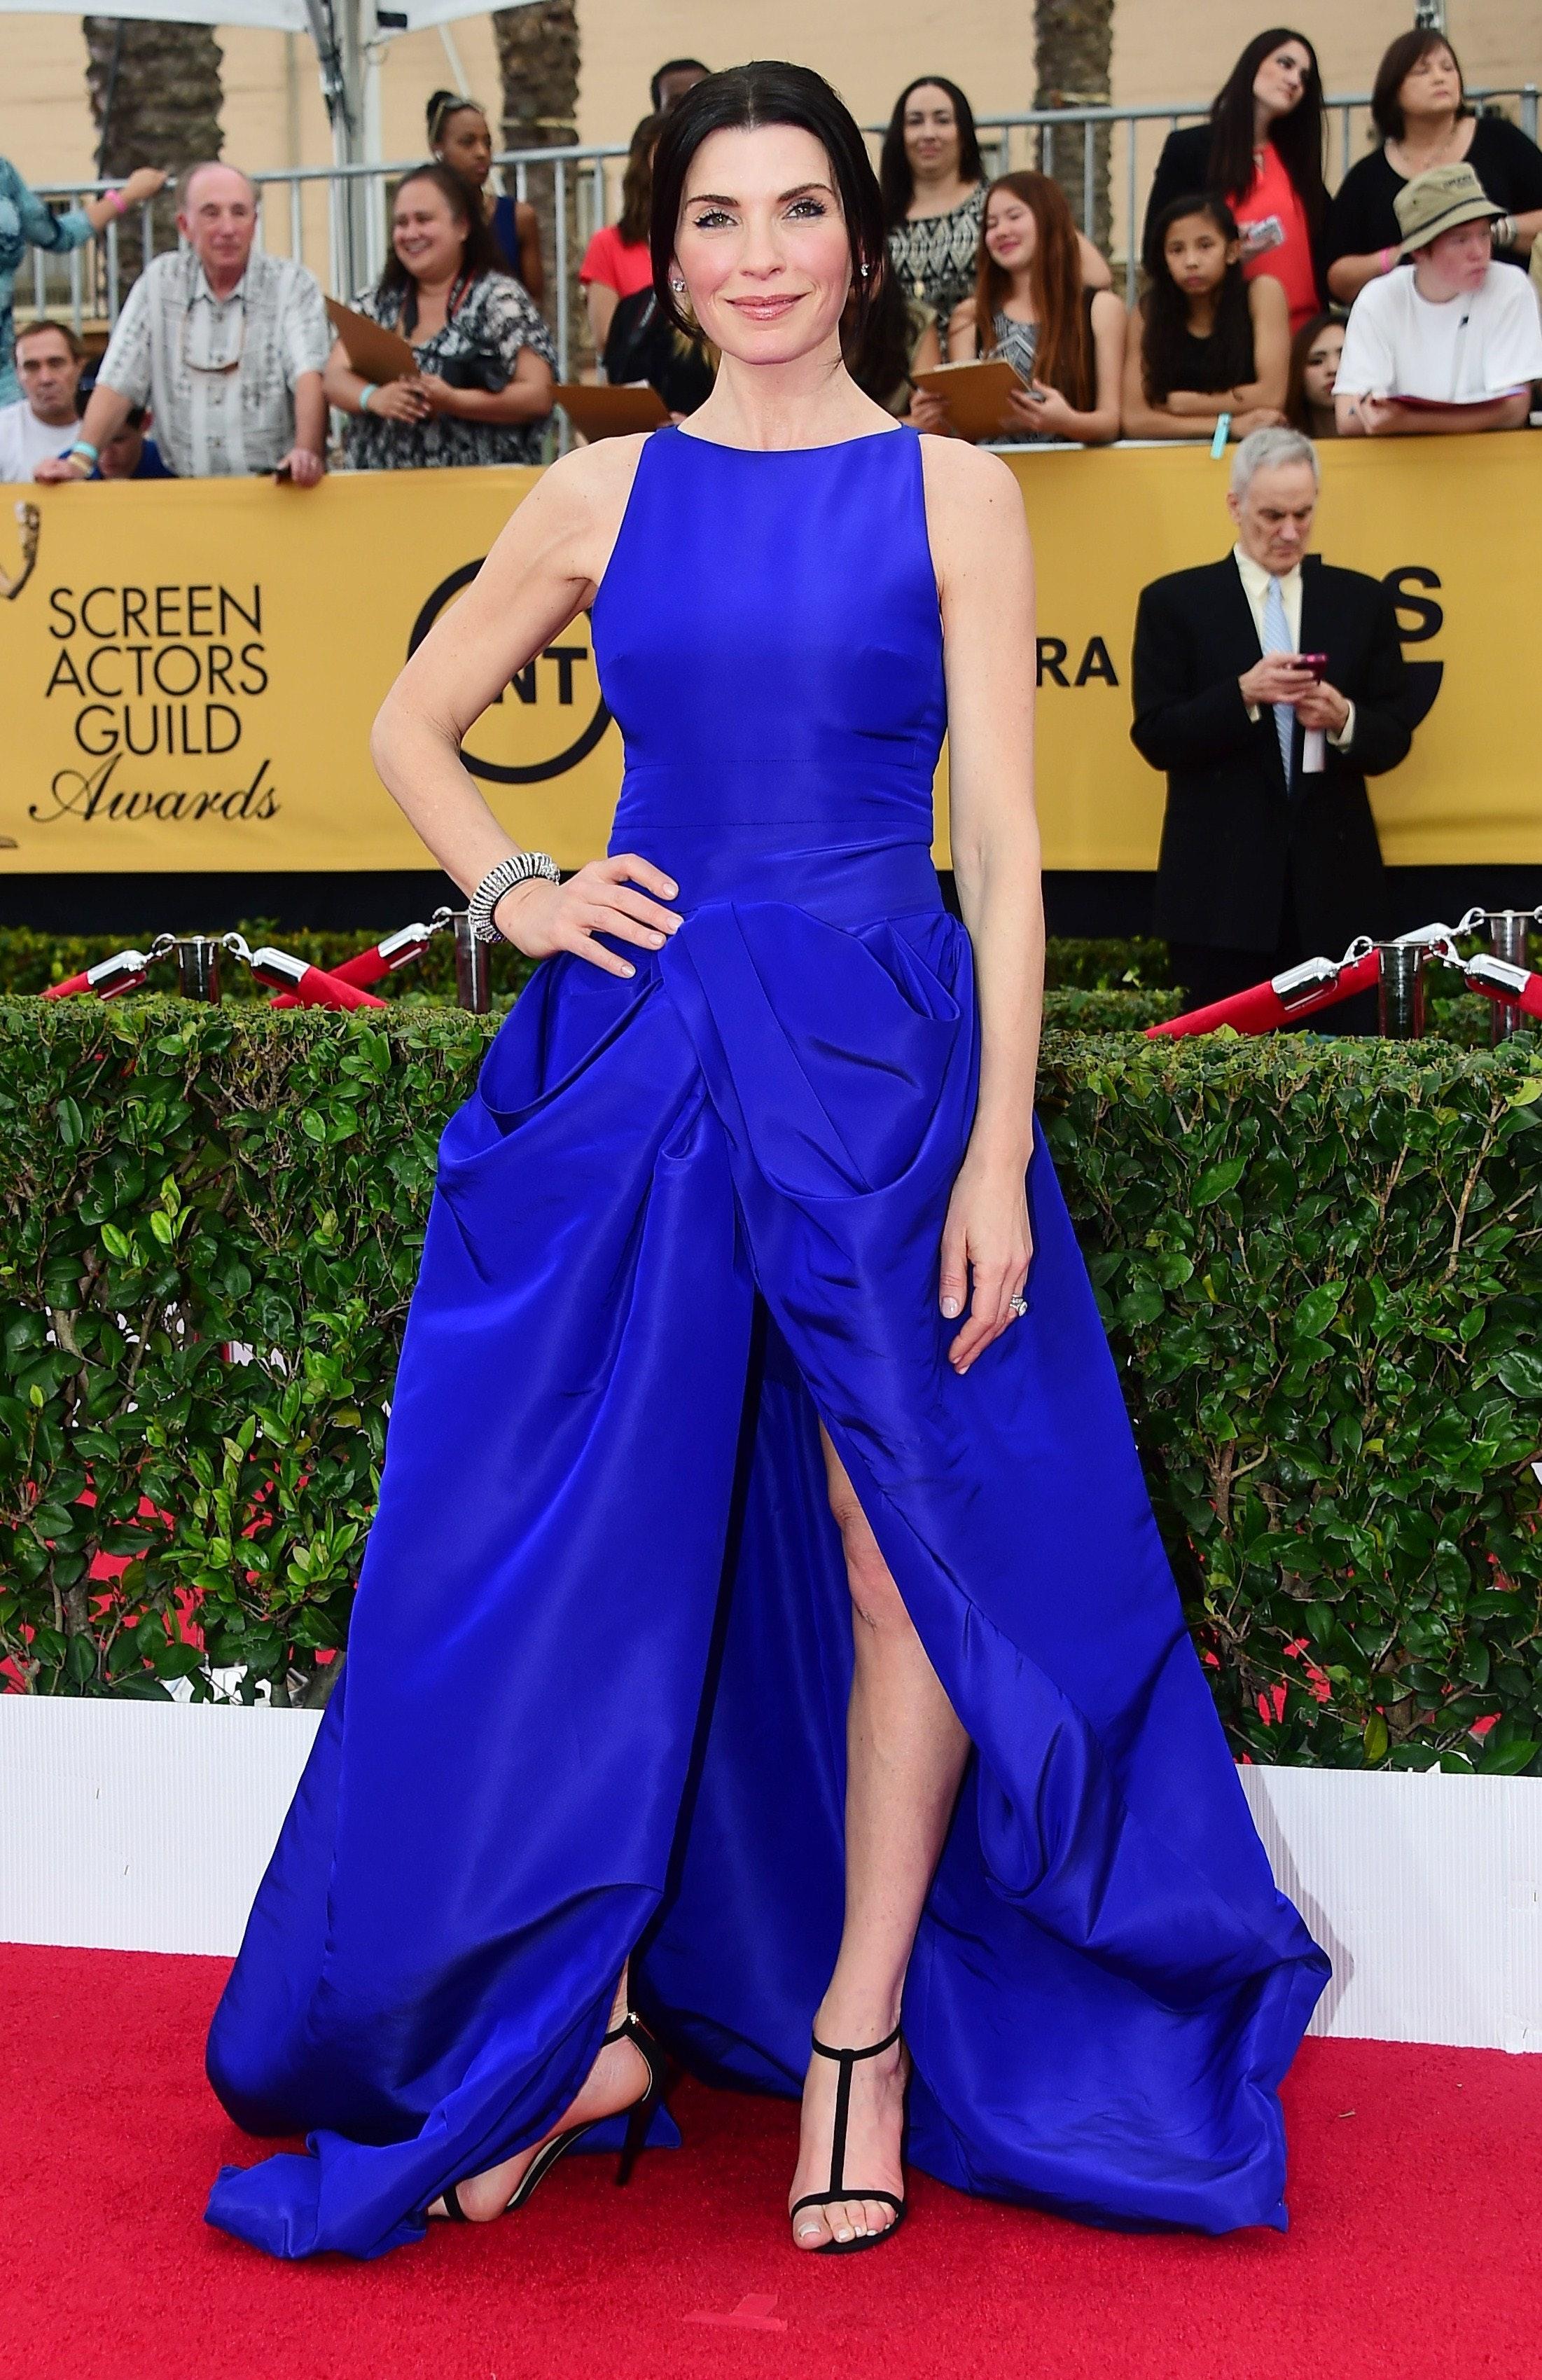 Blue dress red carpet 94